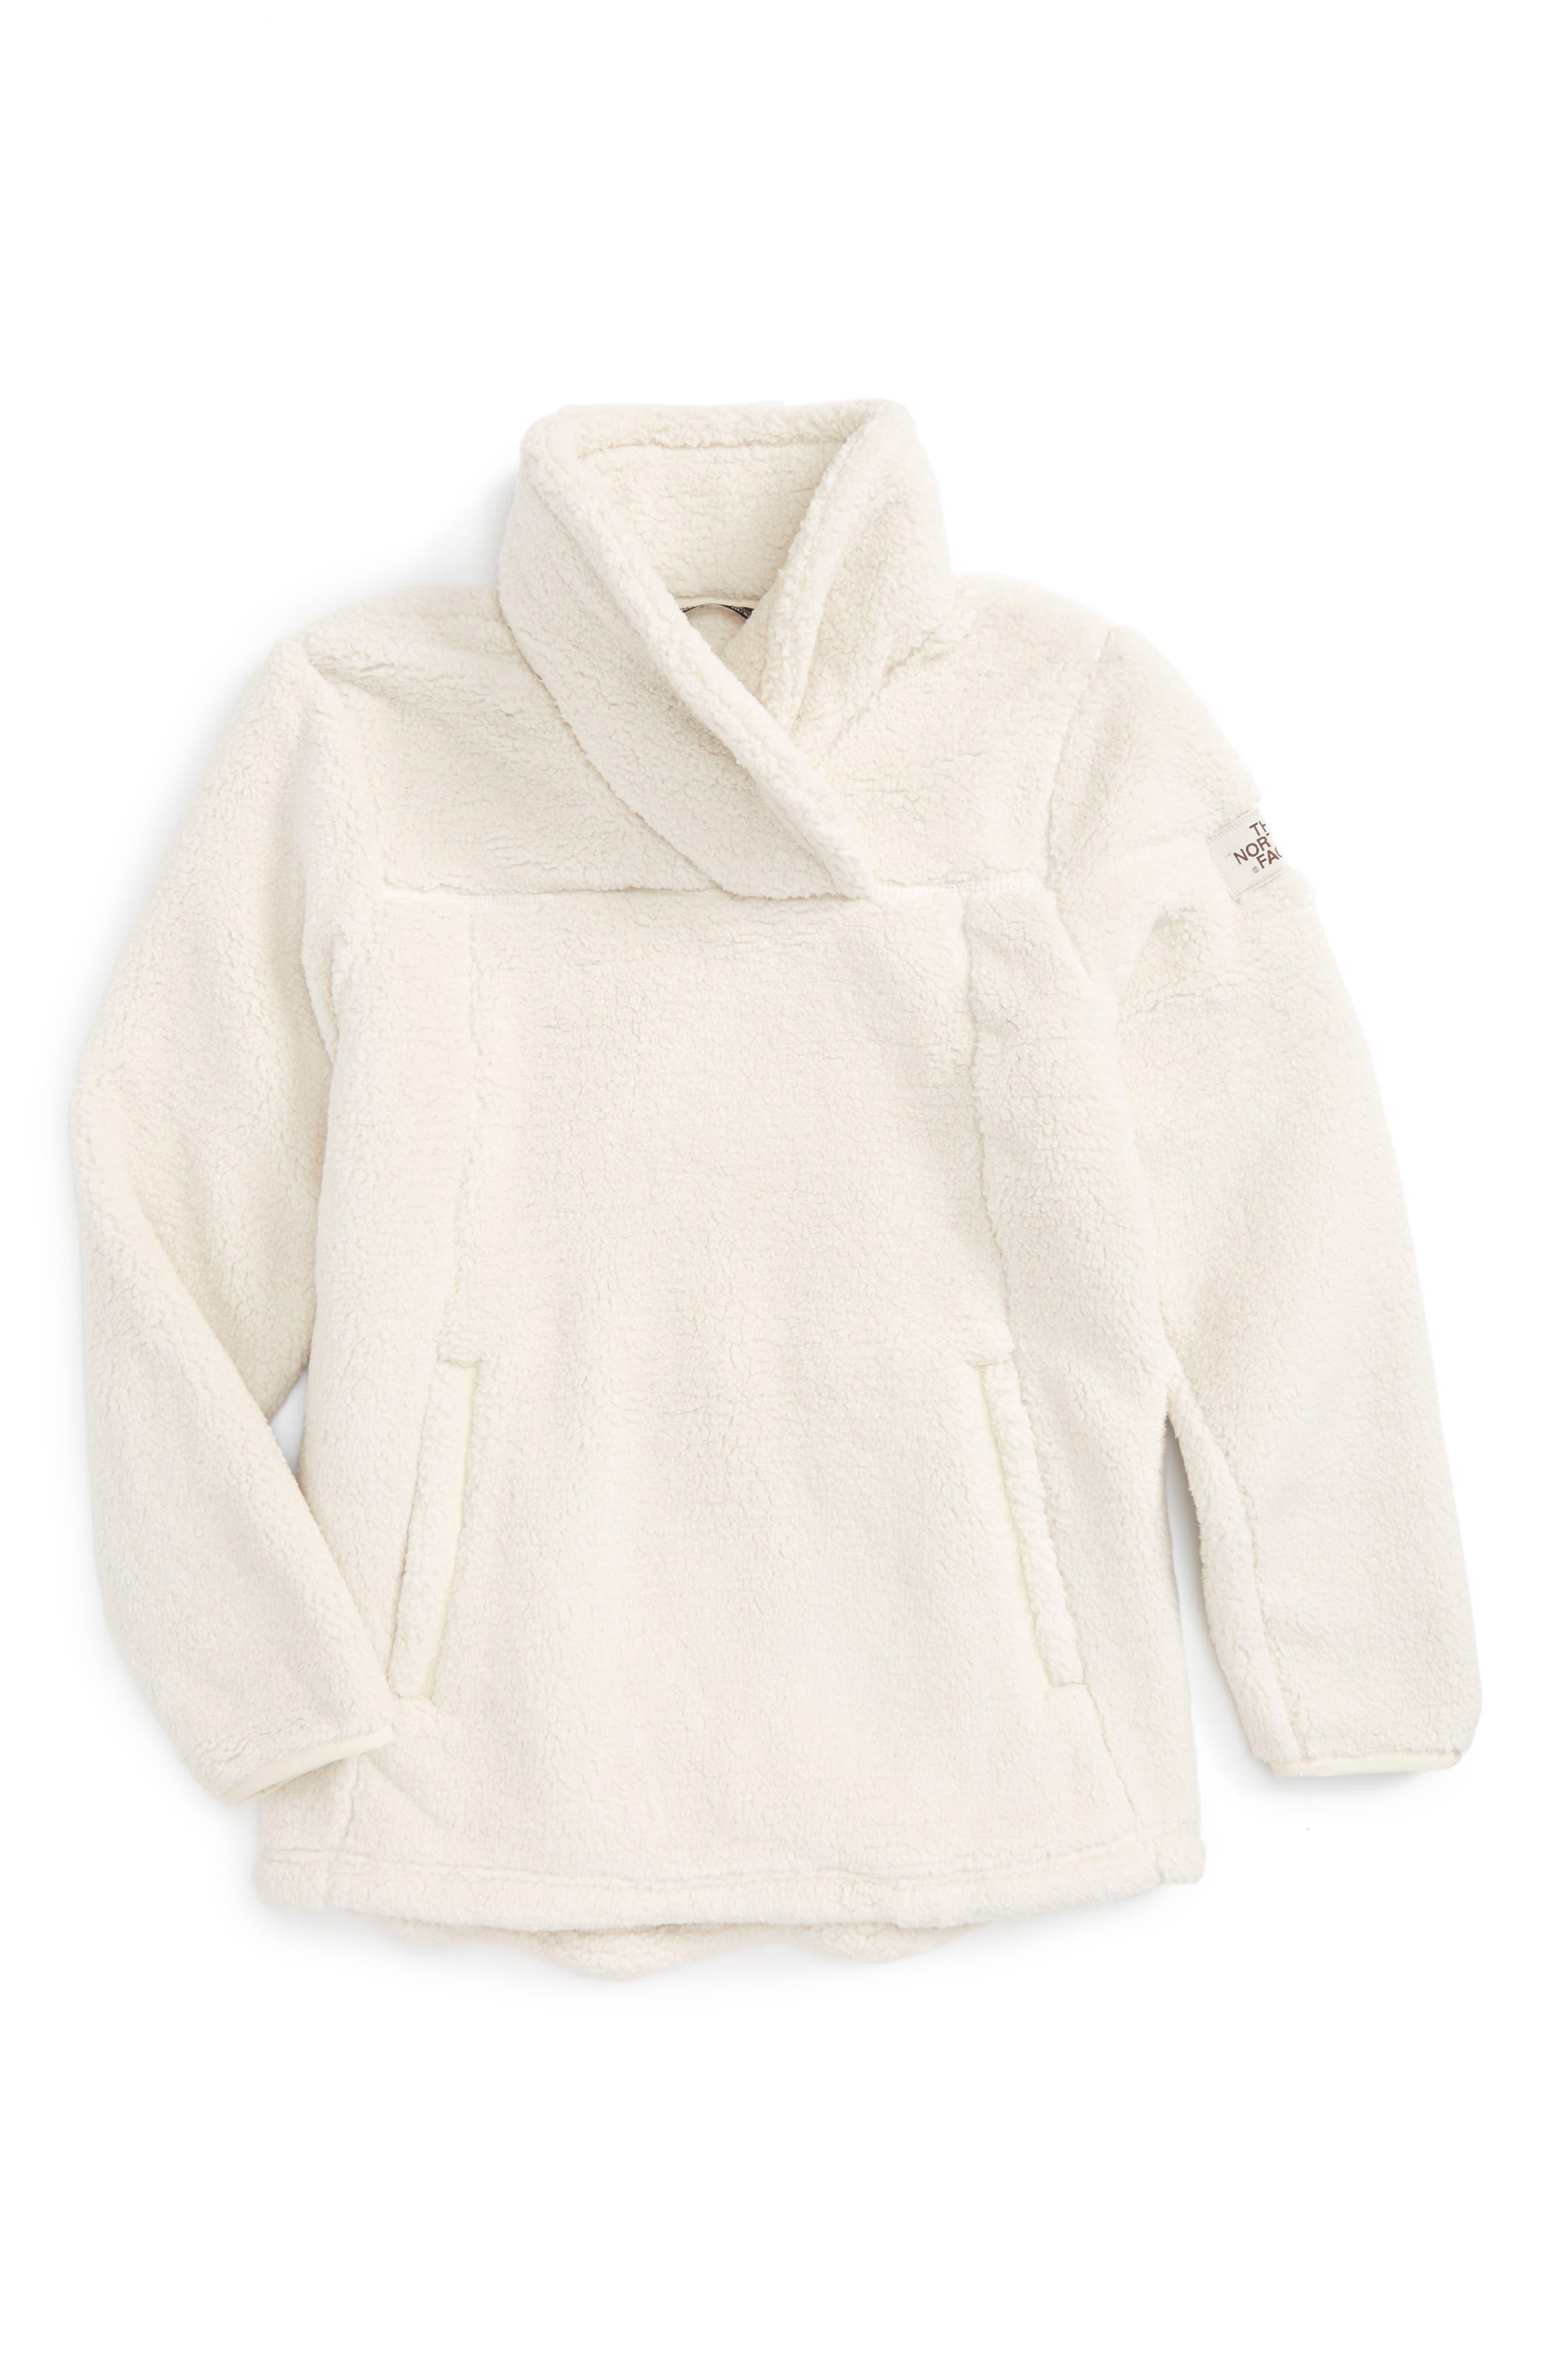 Khampfire Fleece Pullover,                         Main,                         color, Vintage White